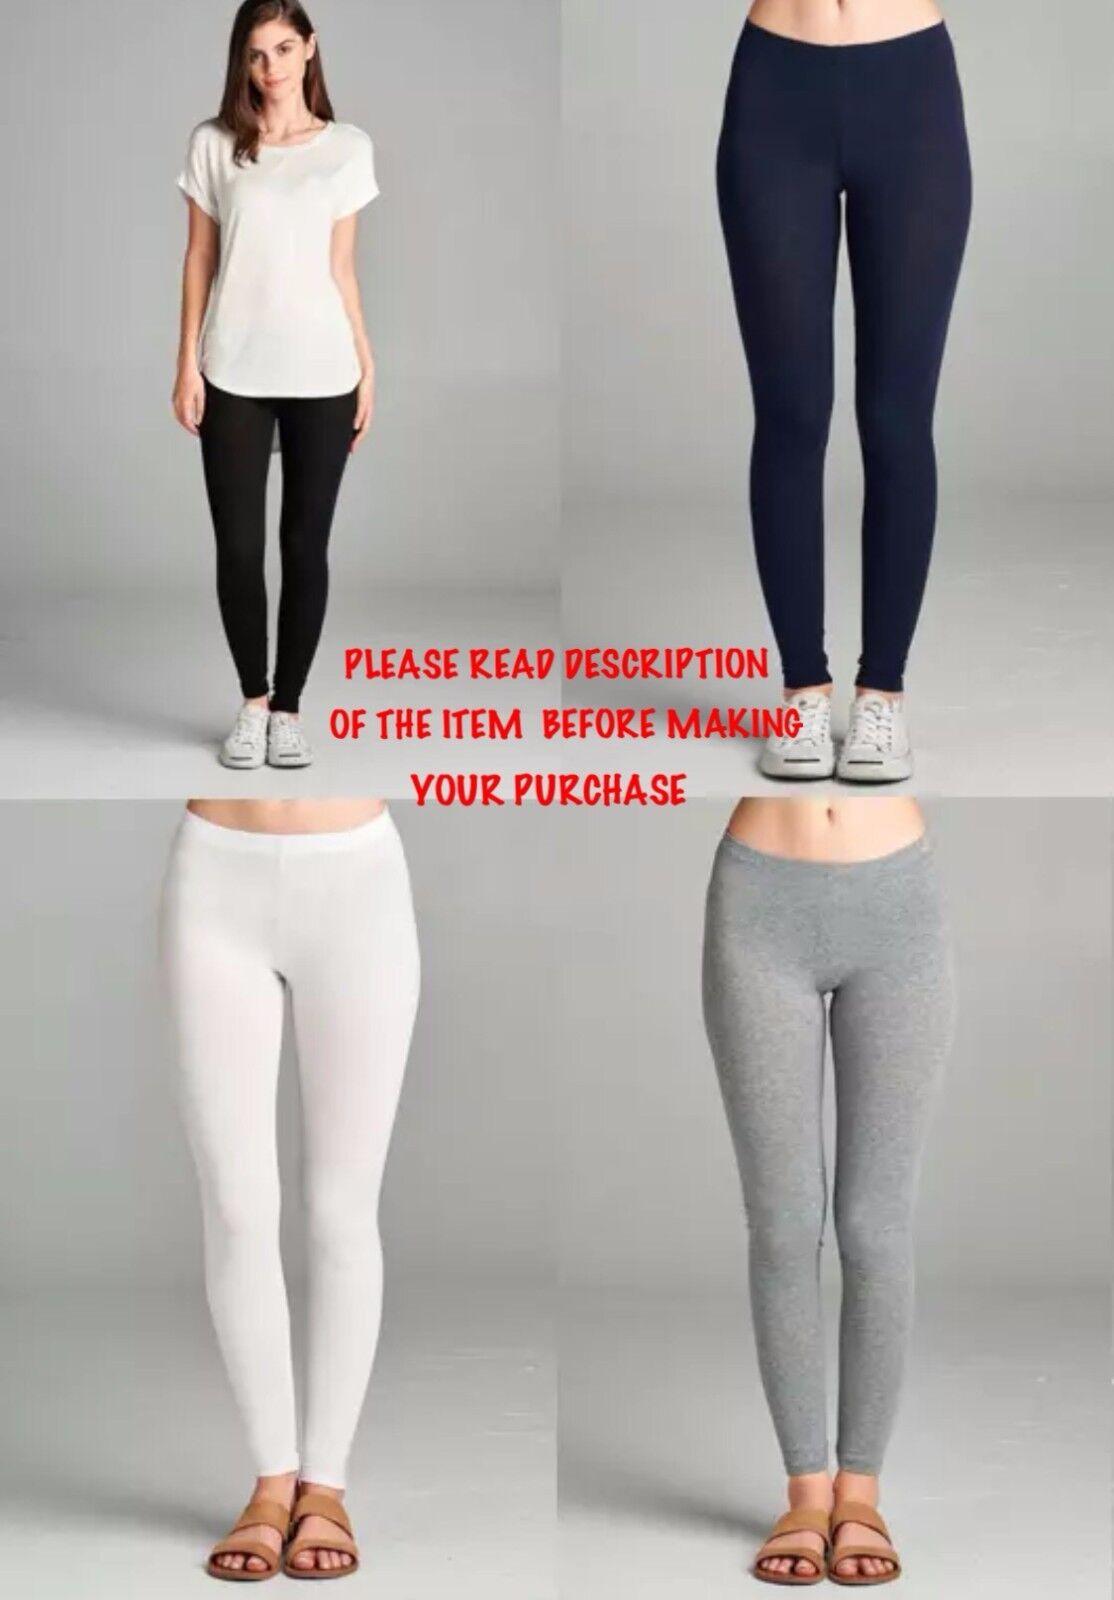 Leggings - Basic Full-Length Cotton Spandex Stretch Leggings Yoga Active Pants